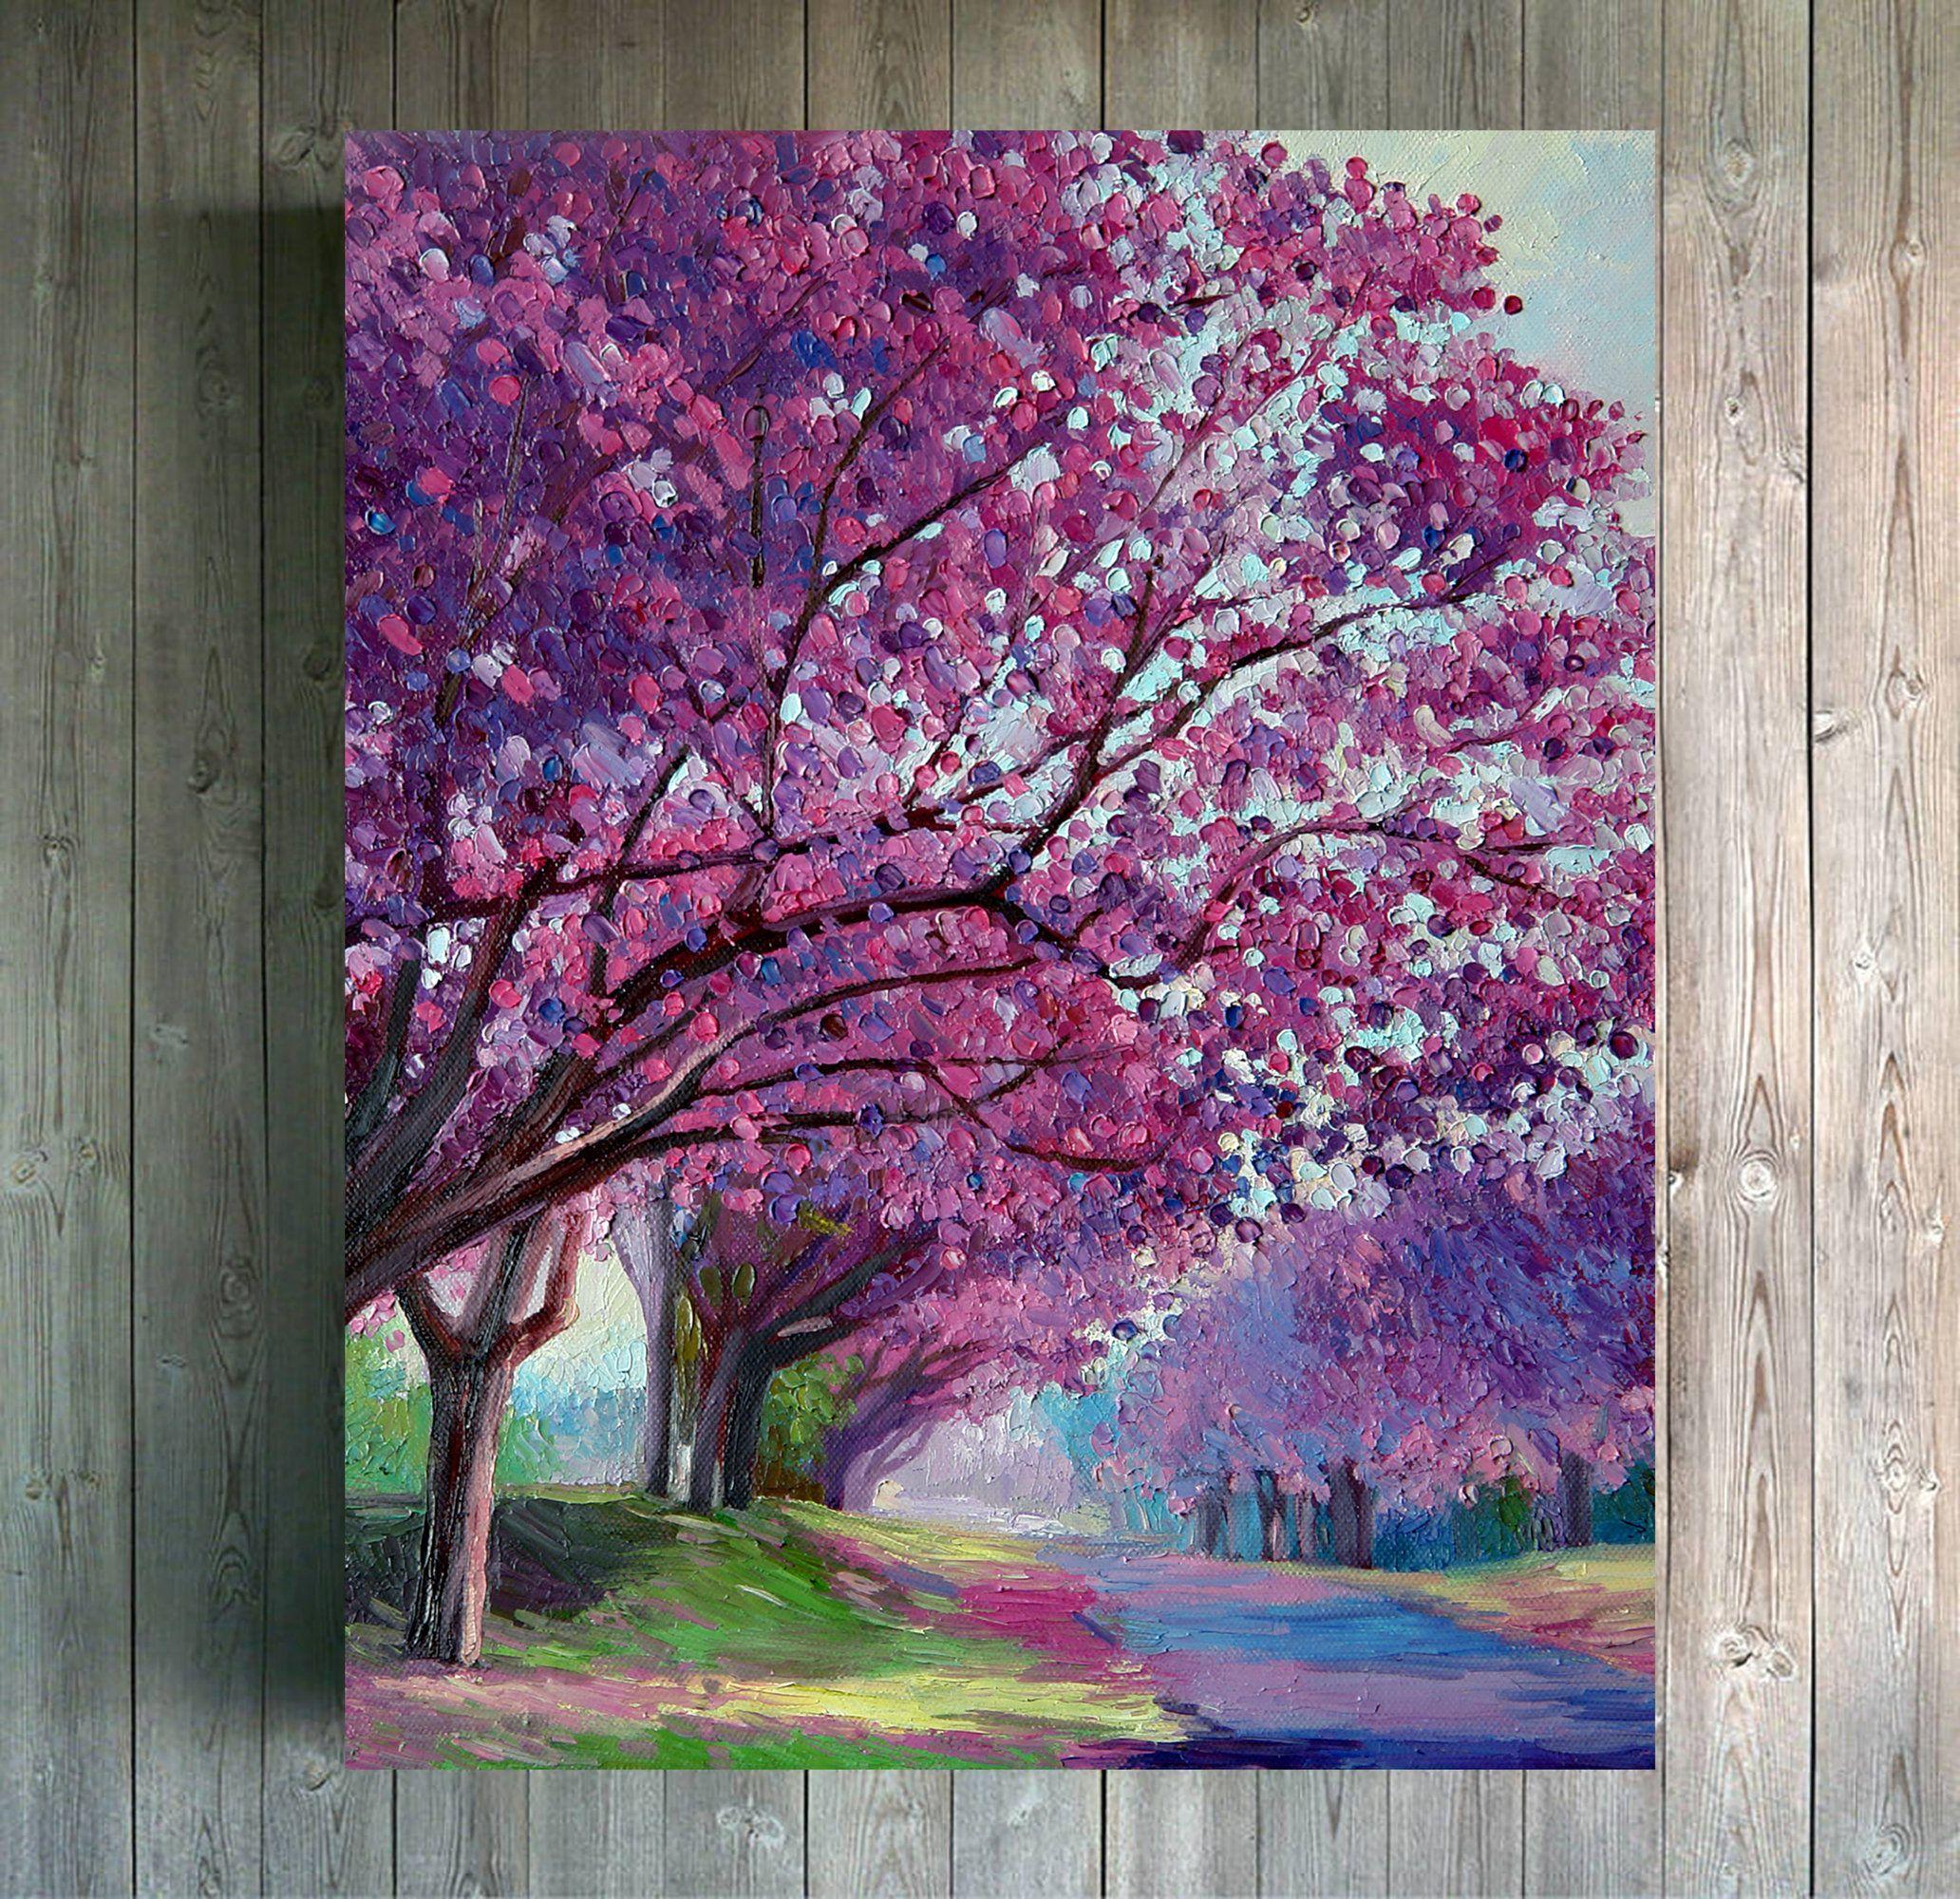 Landscape Blossom Trees Impasto Oil Painting On Canvas Impressionism Art Fruit Trees Flowers Blooming Flowers Trees Gift Idea In 2021 Tree Painting Cherry Blossom Painting Blossom Trees